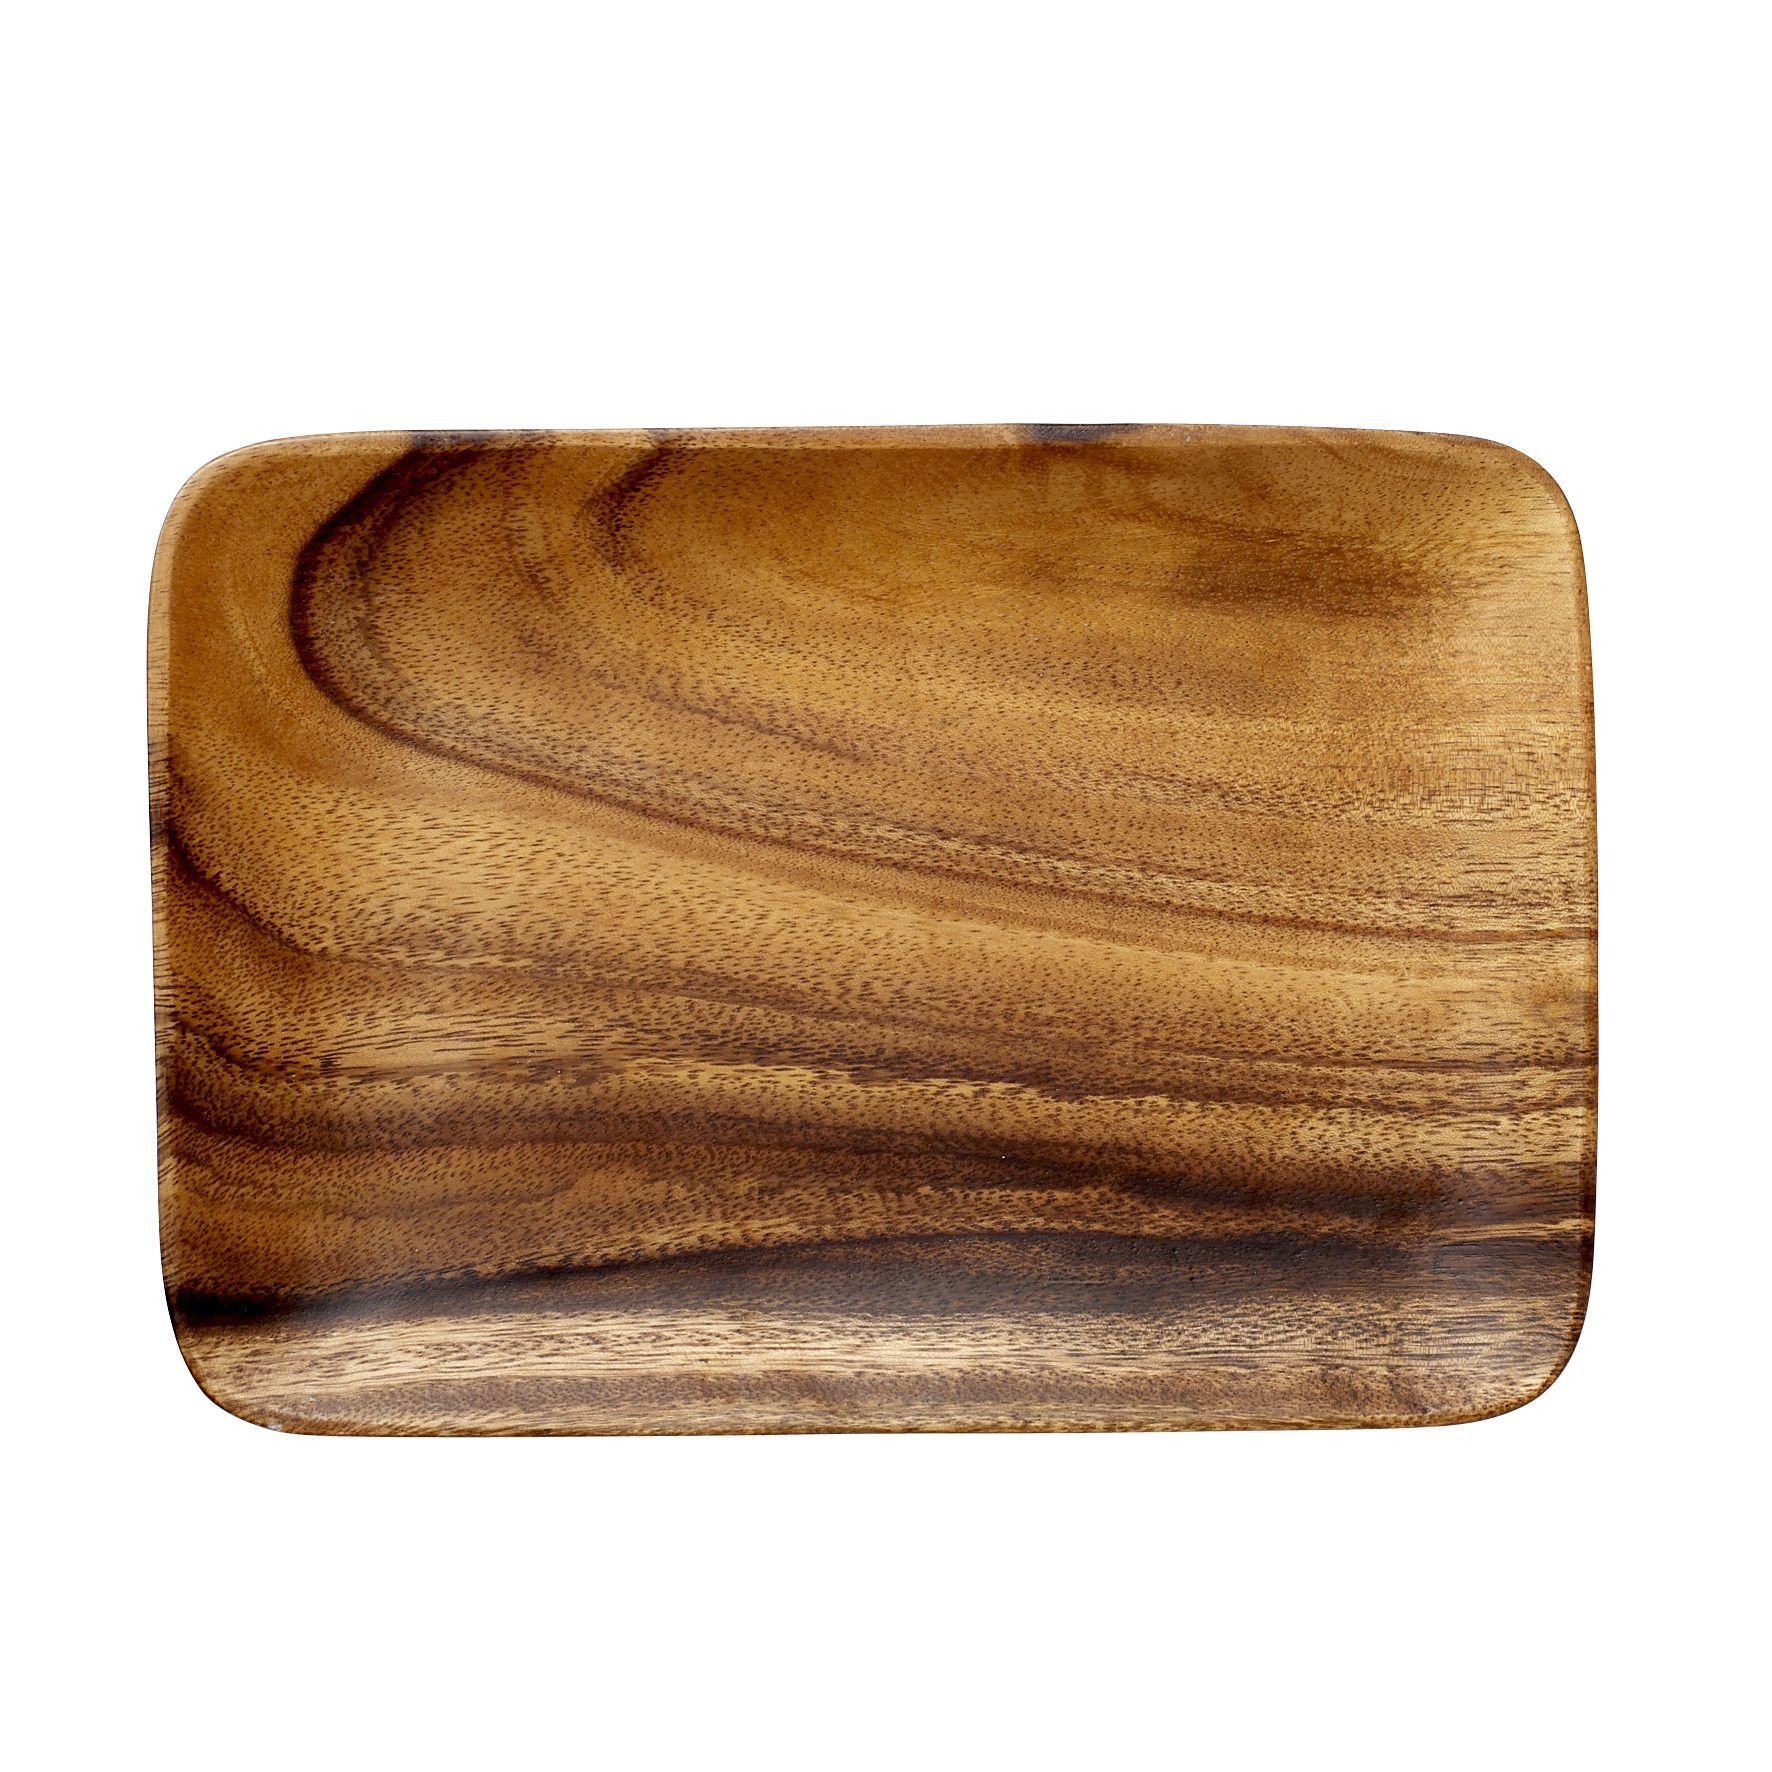 Acacia Wood Tray Wood Tray Acacia Wood Wooden Platters